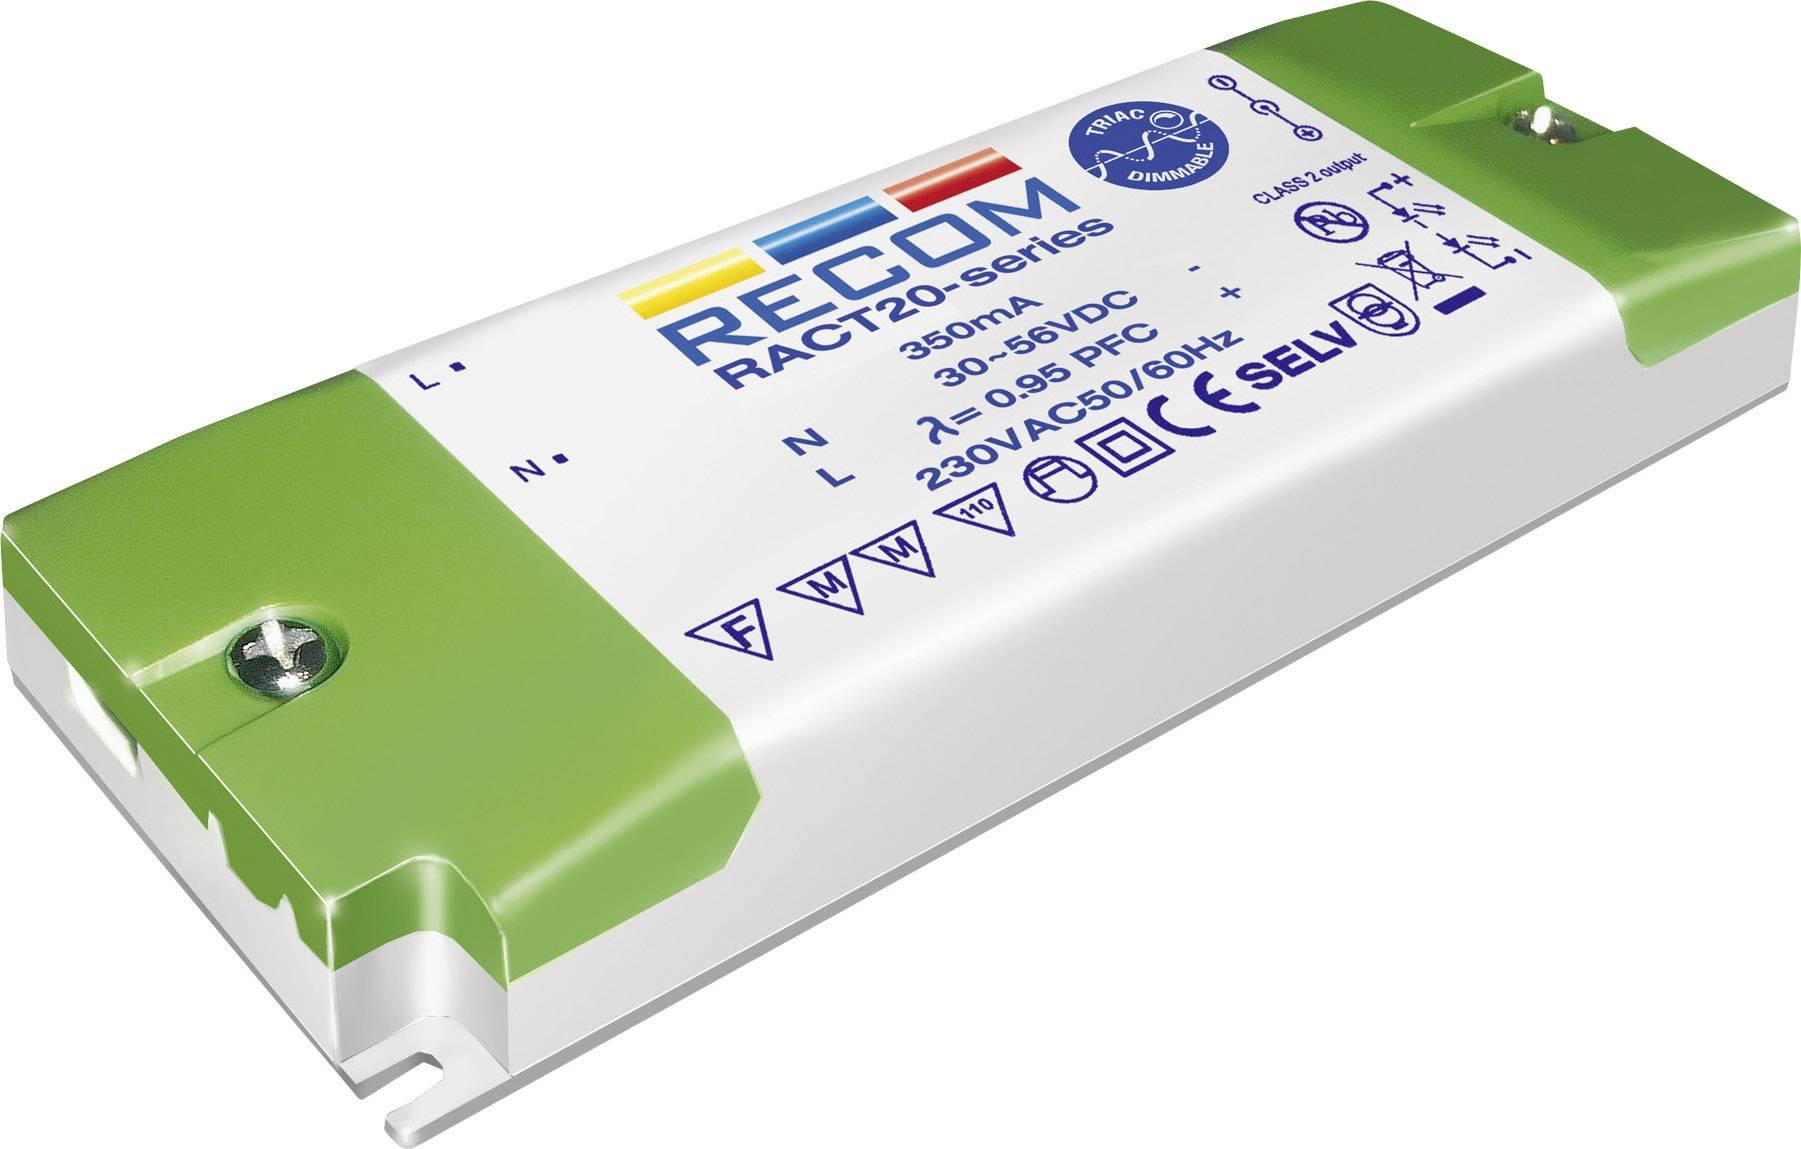 LED driver Recom Lighting RACT20-1050, 20 W (max), 1.05 A, 12 - 18 V/DC